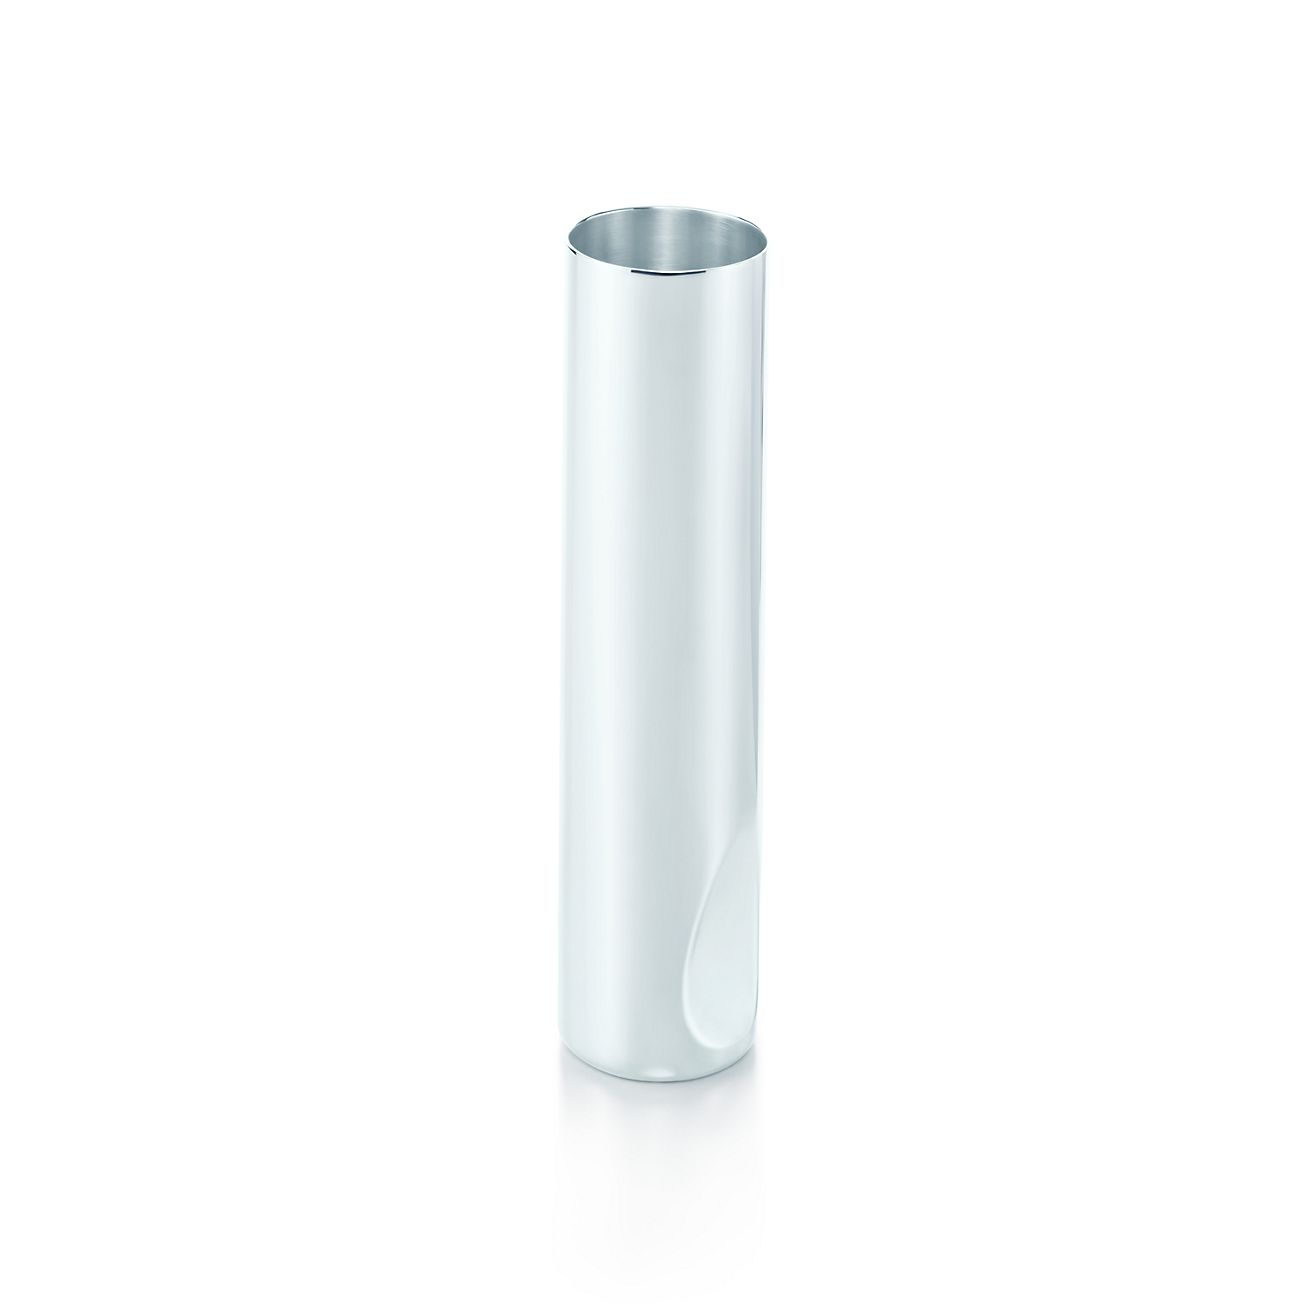 Elsa peretti thumbprint bud vase in sterling silver tiffany co elsa perettithumbprint bud vase reviewsmspy